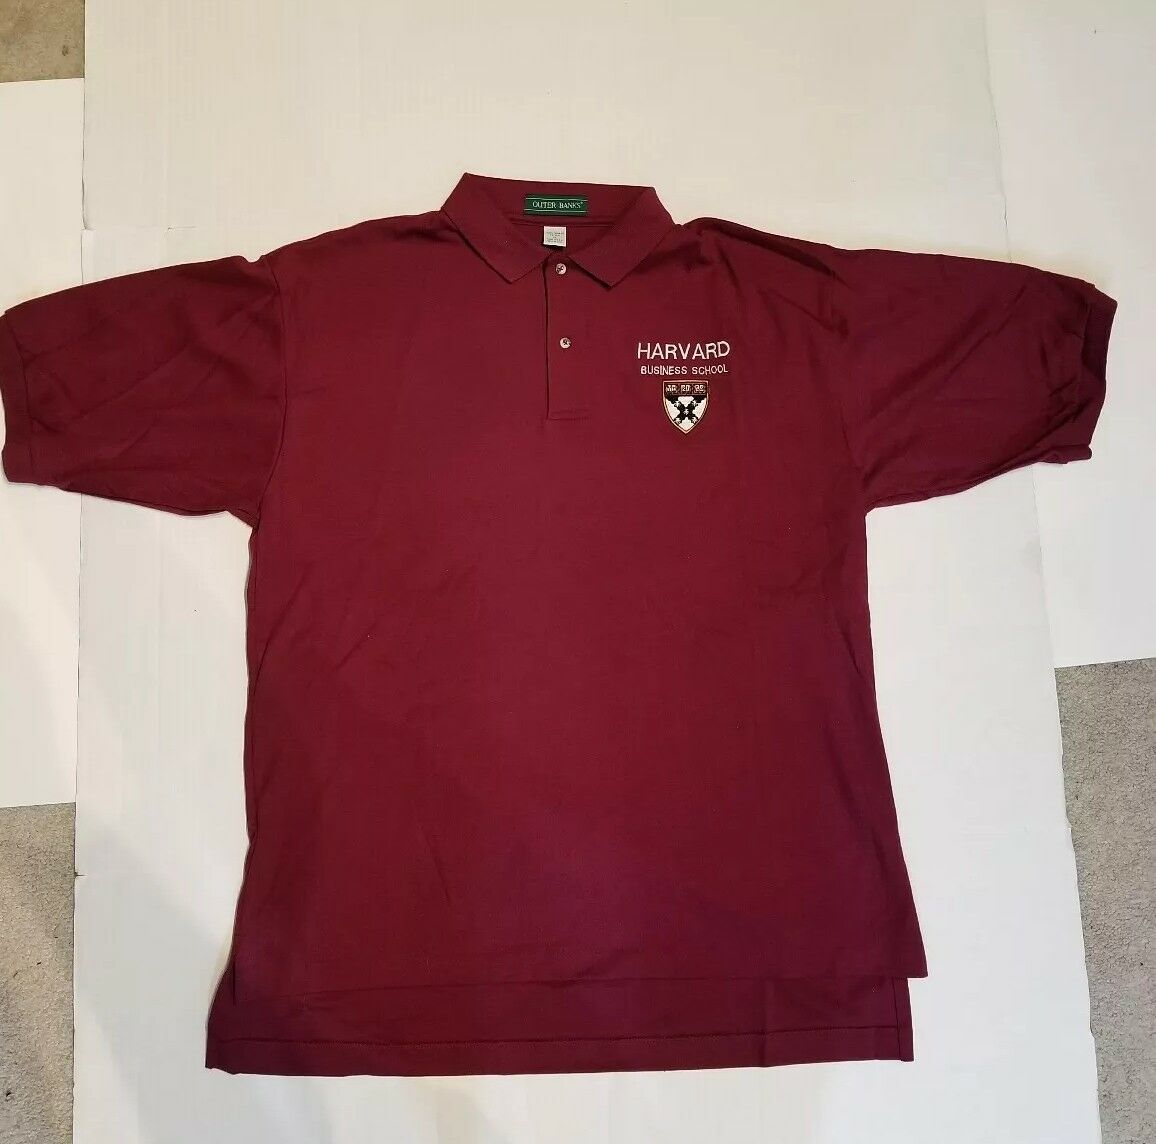 Harvard Business School Polo Embroidered Shirt Clothing Alumni Alma Mater sz XL